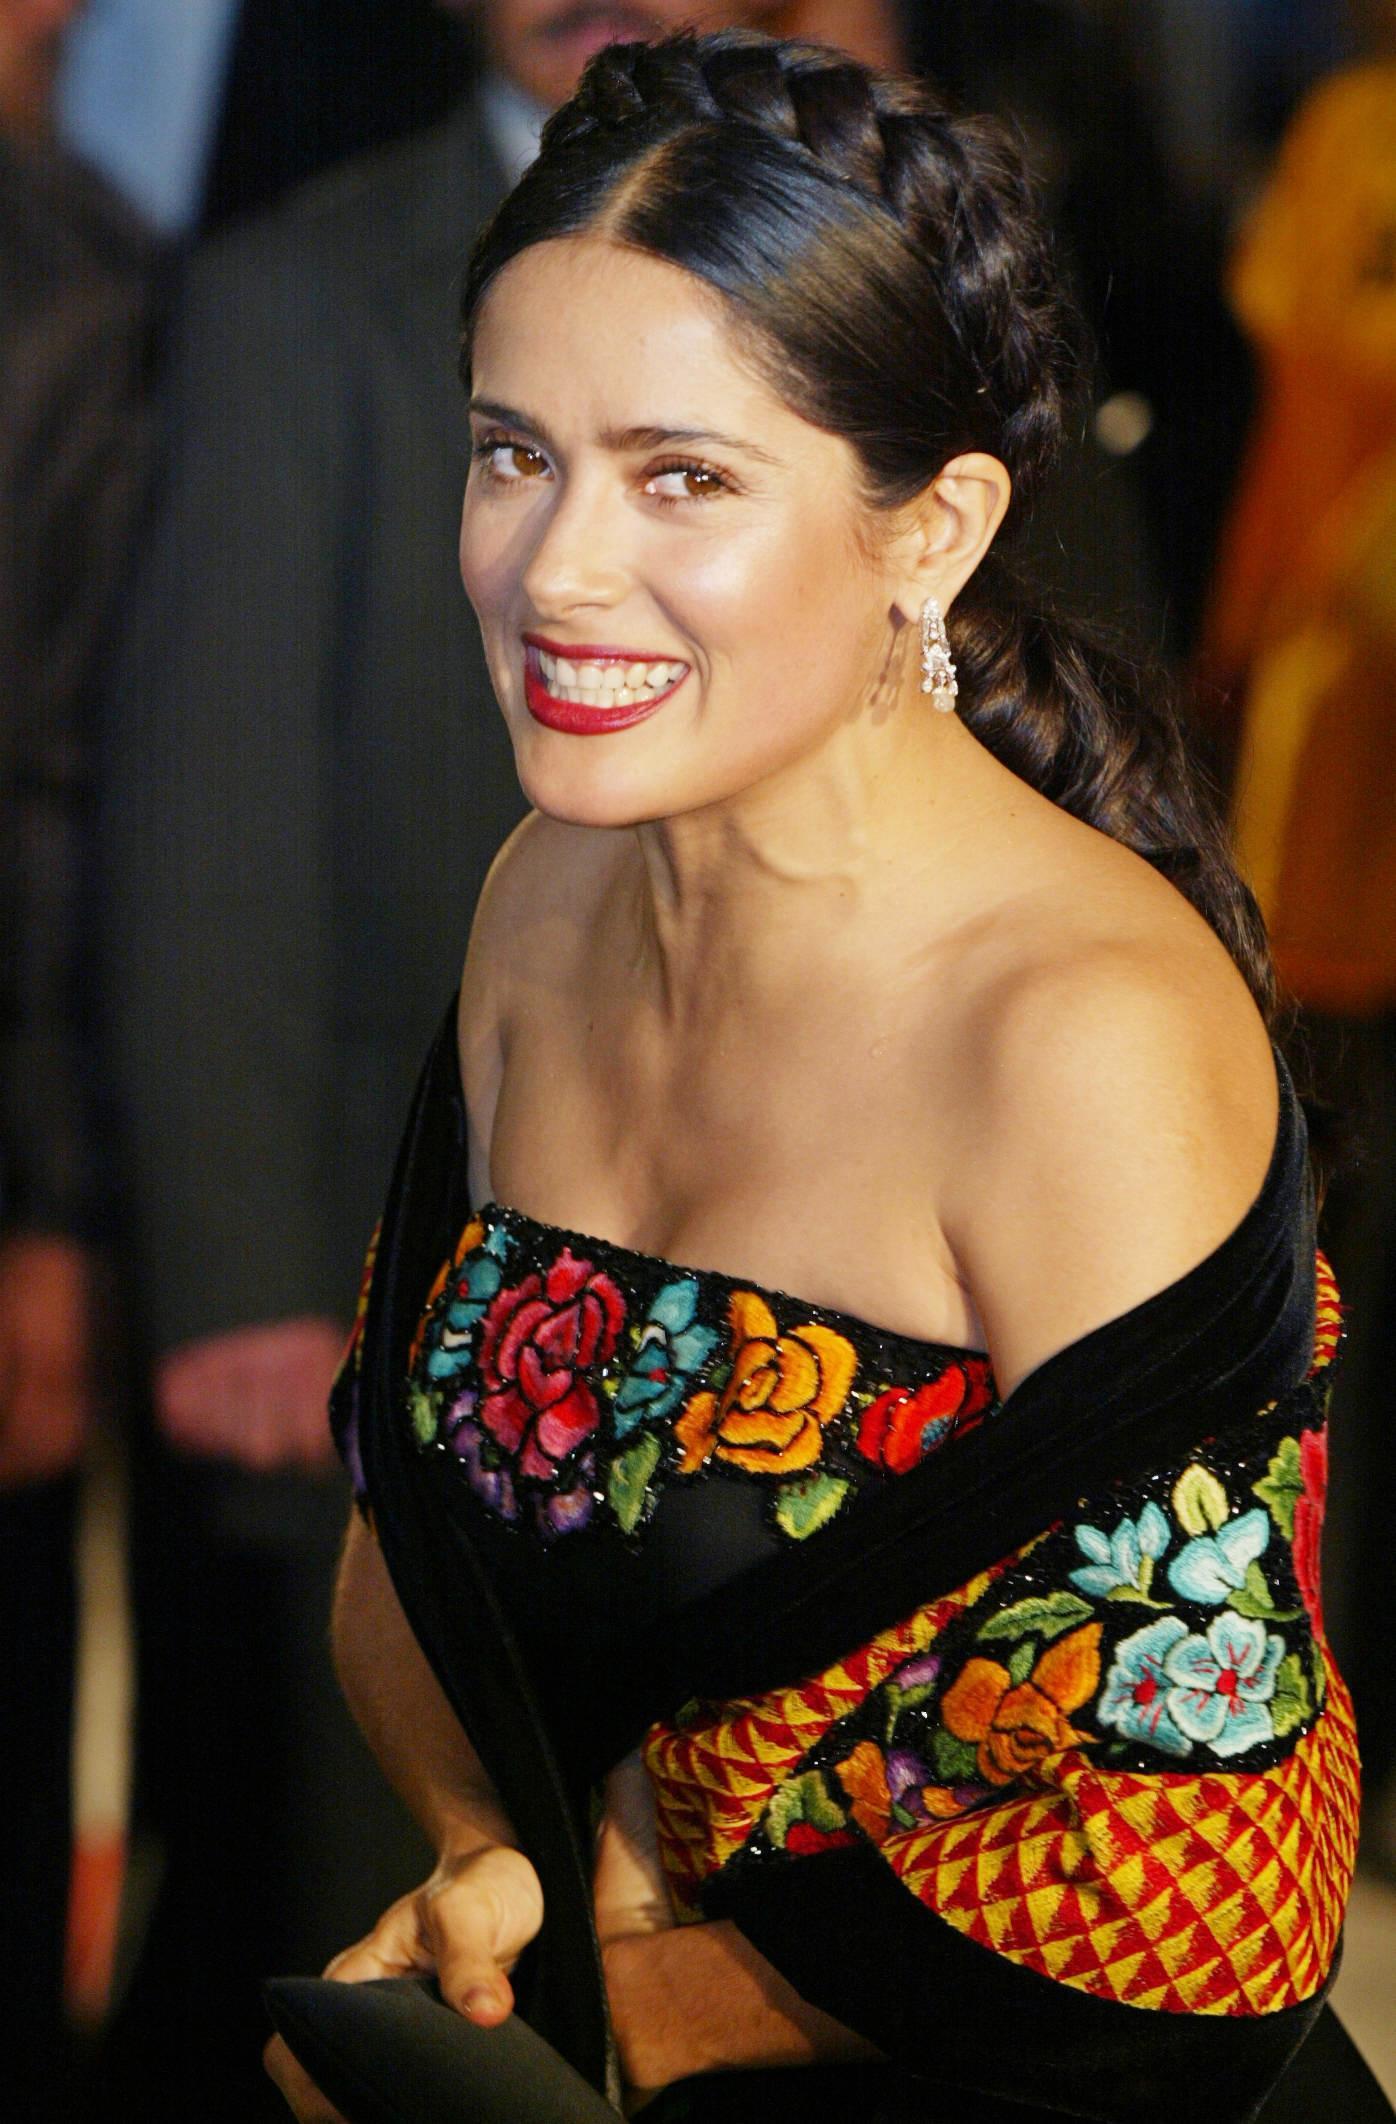 Mexican actress Salma Hayek arrives at the Palace